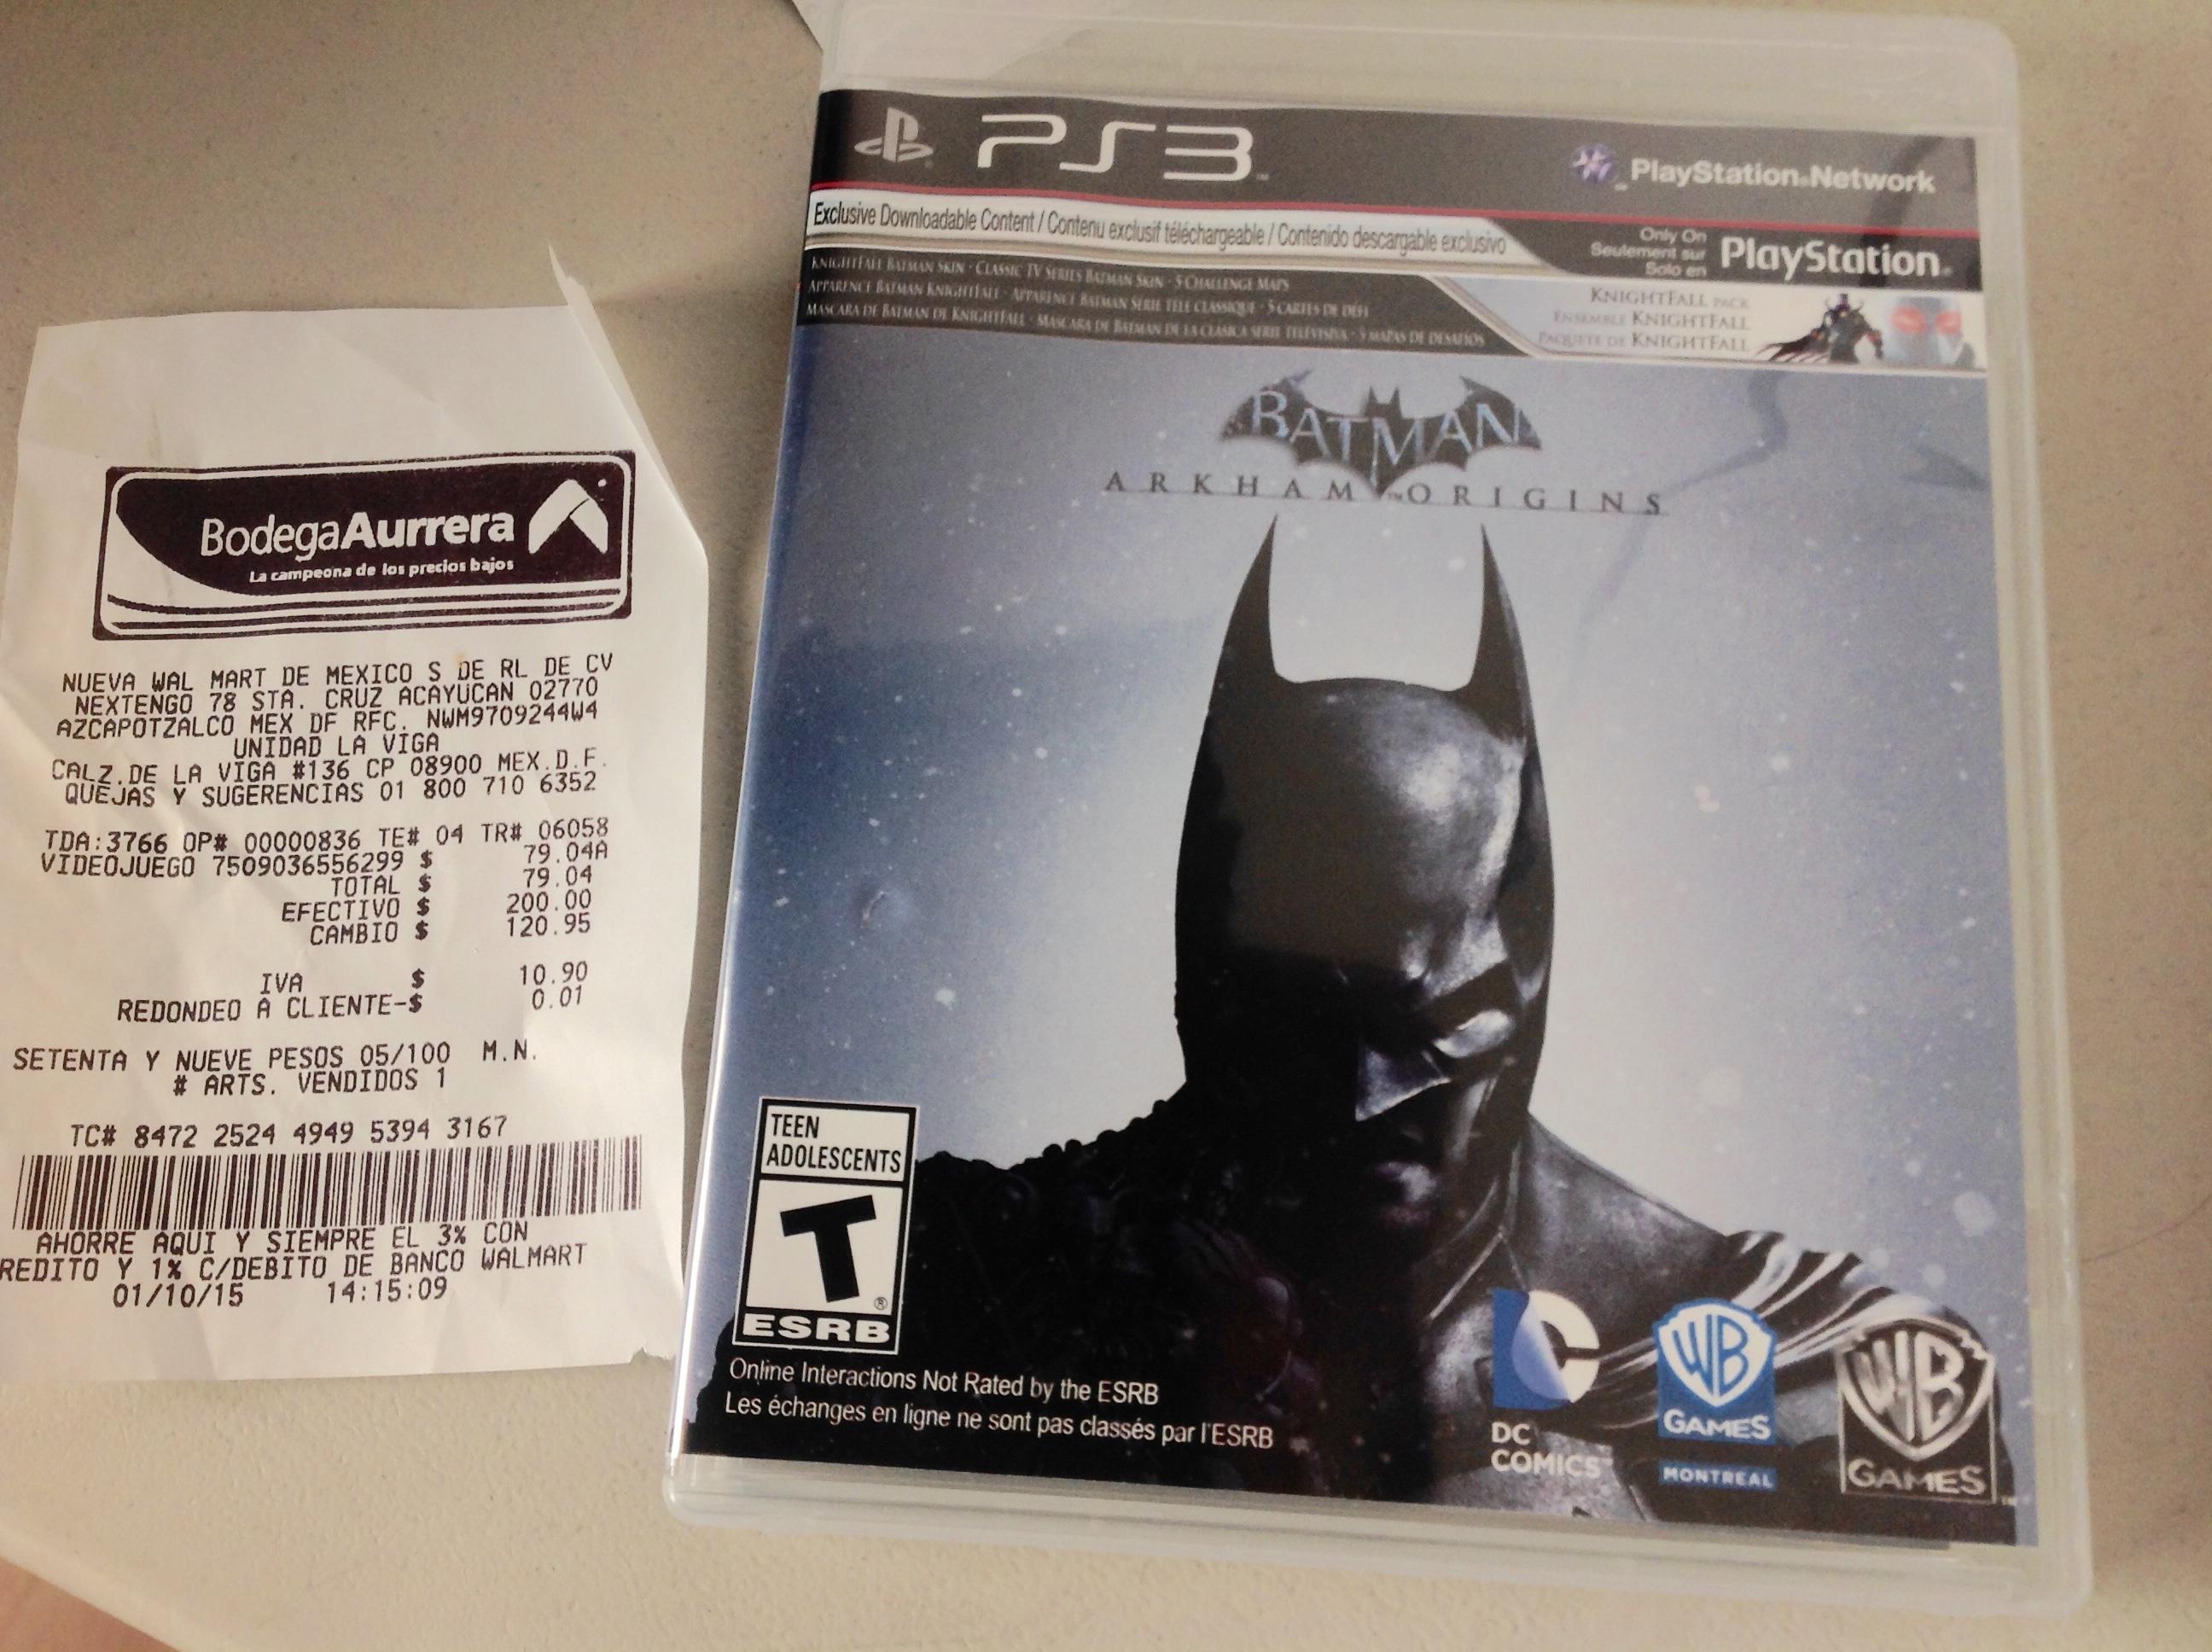 Bodega Aurrerá: Batman Origin $79